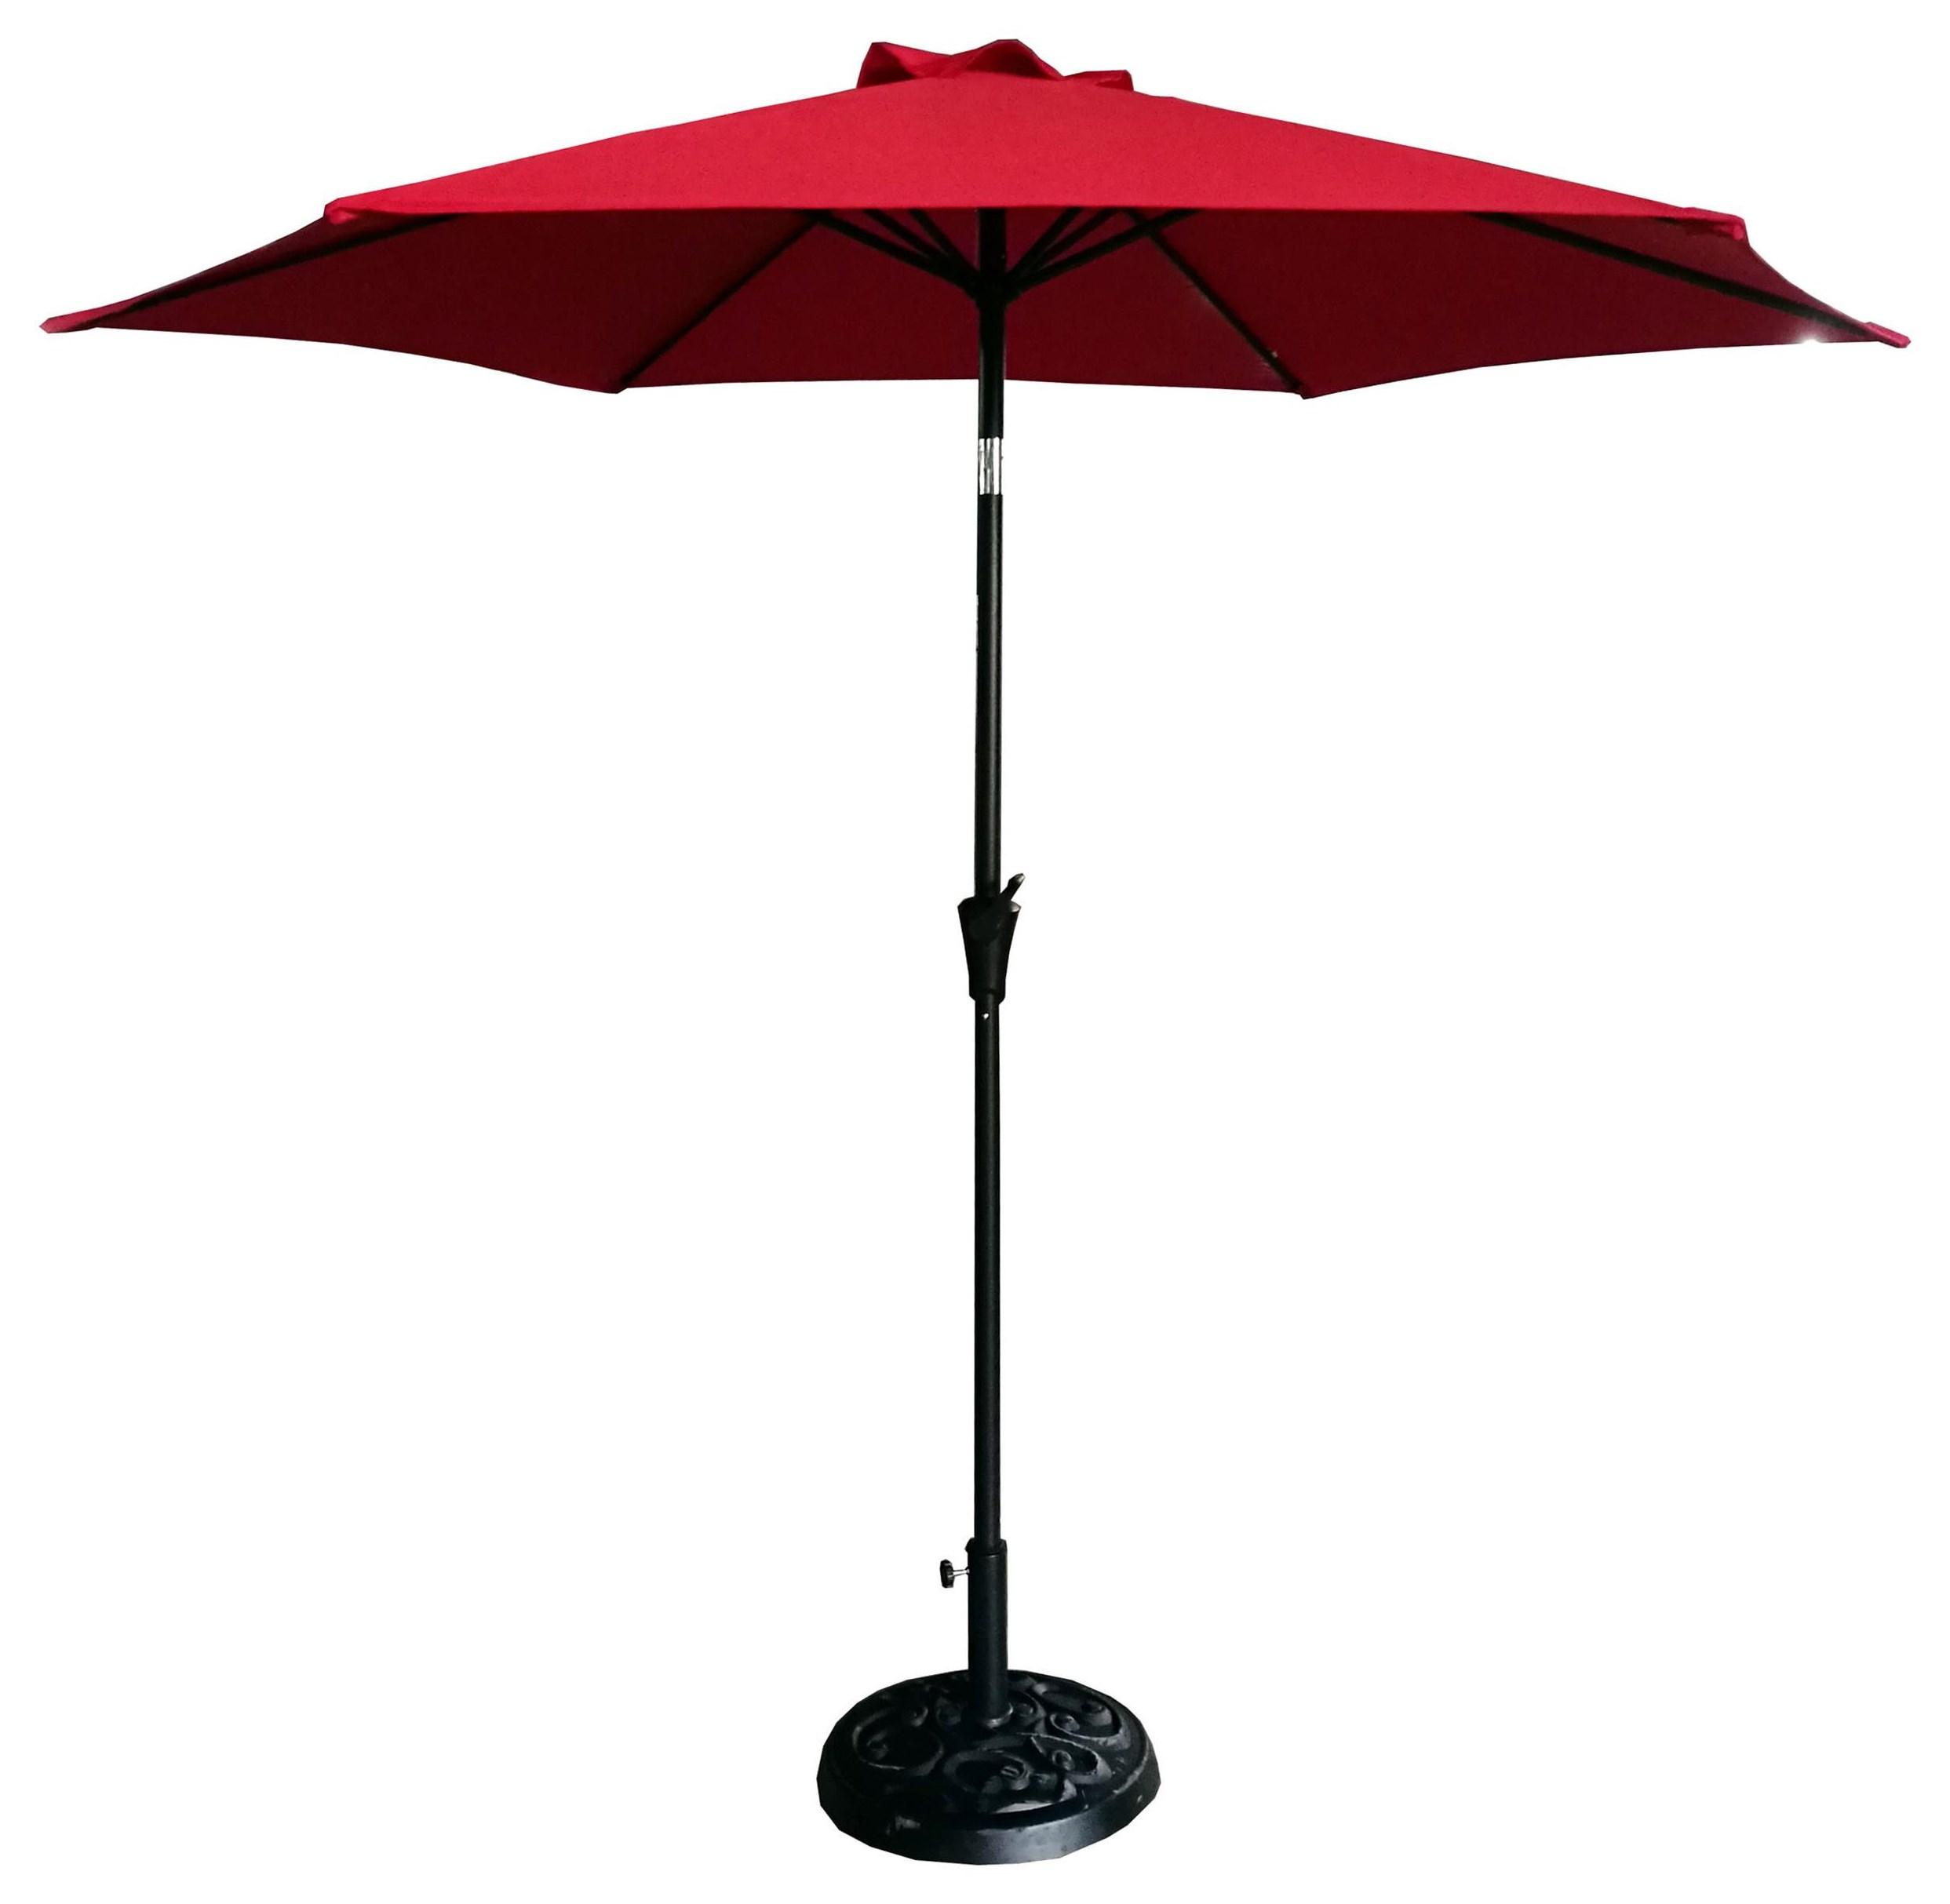 UMBRELLA 9' Red Umbrella by GatherCraft at Darvin Furniture